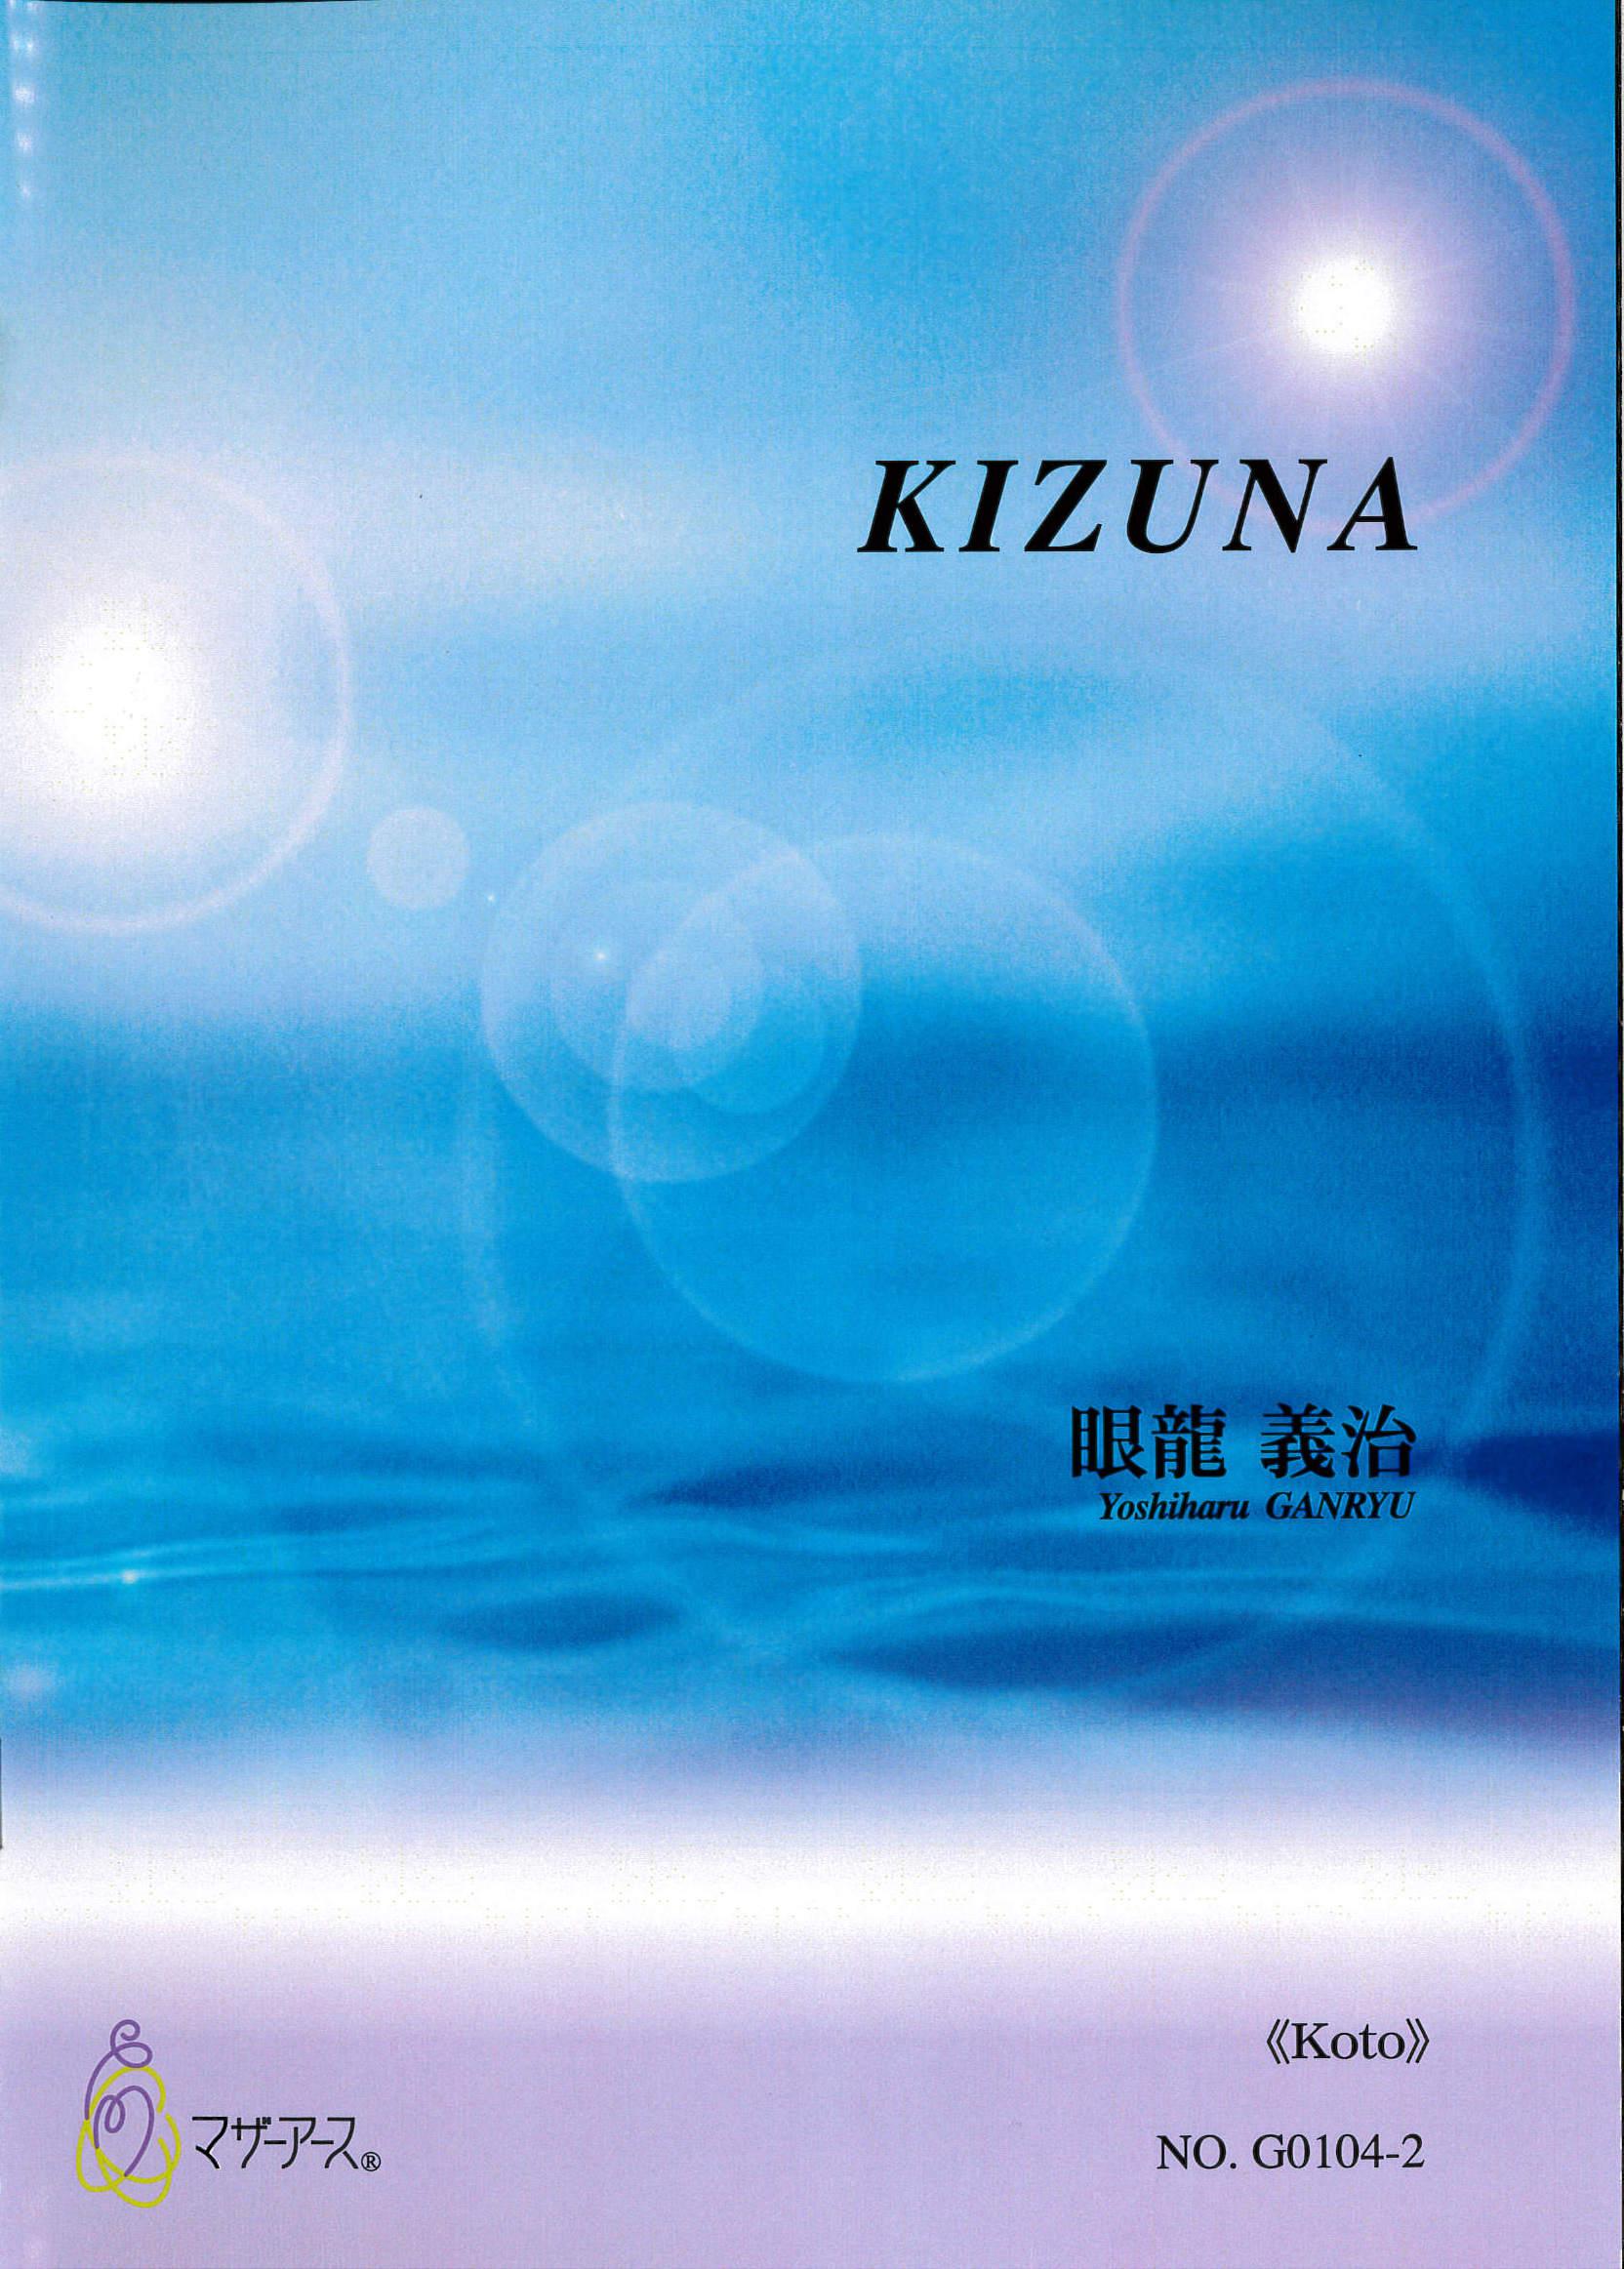 五線譜+箏譜 KIZUNA[5641]